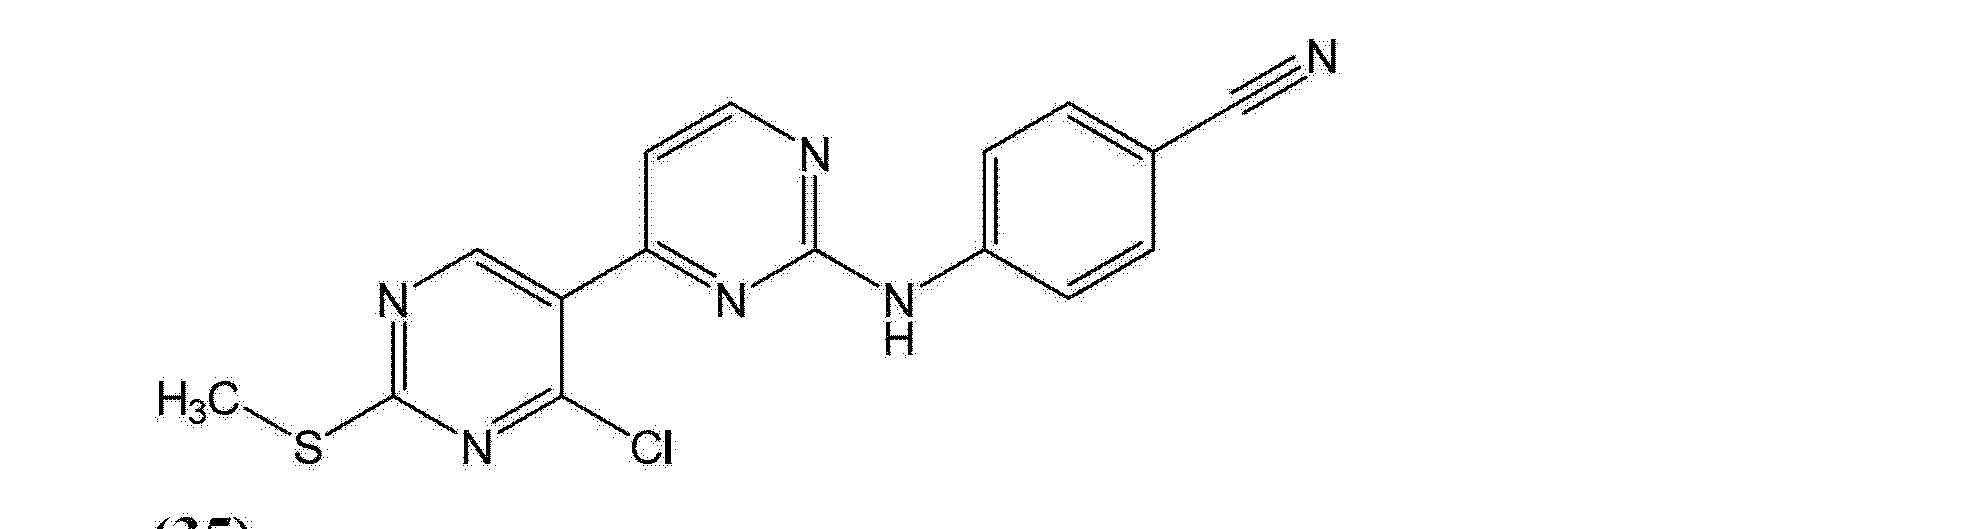 Figure CN103270026AD00802